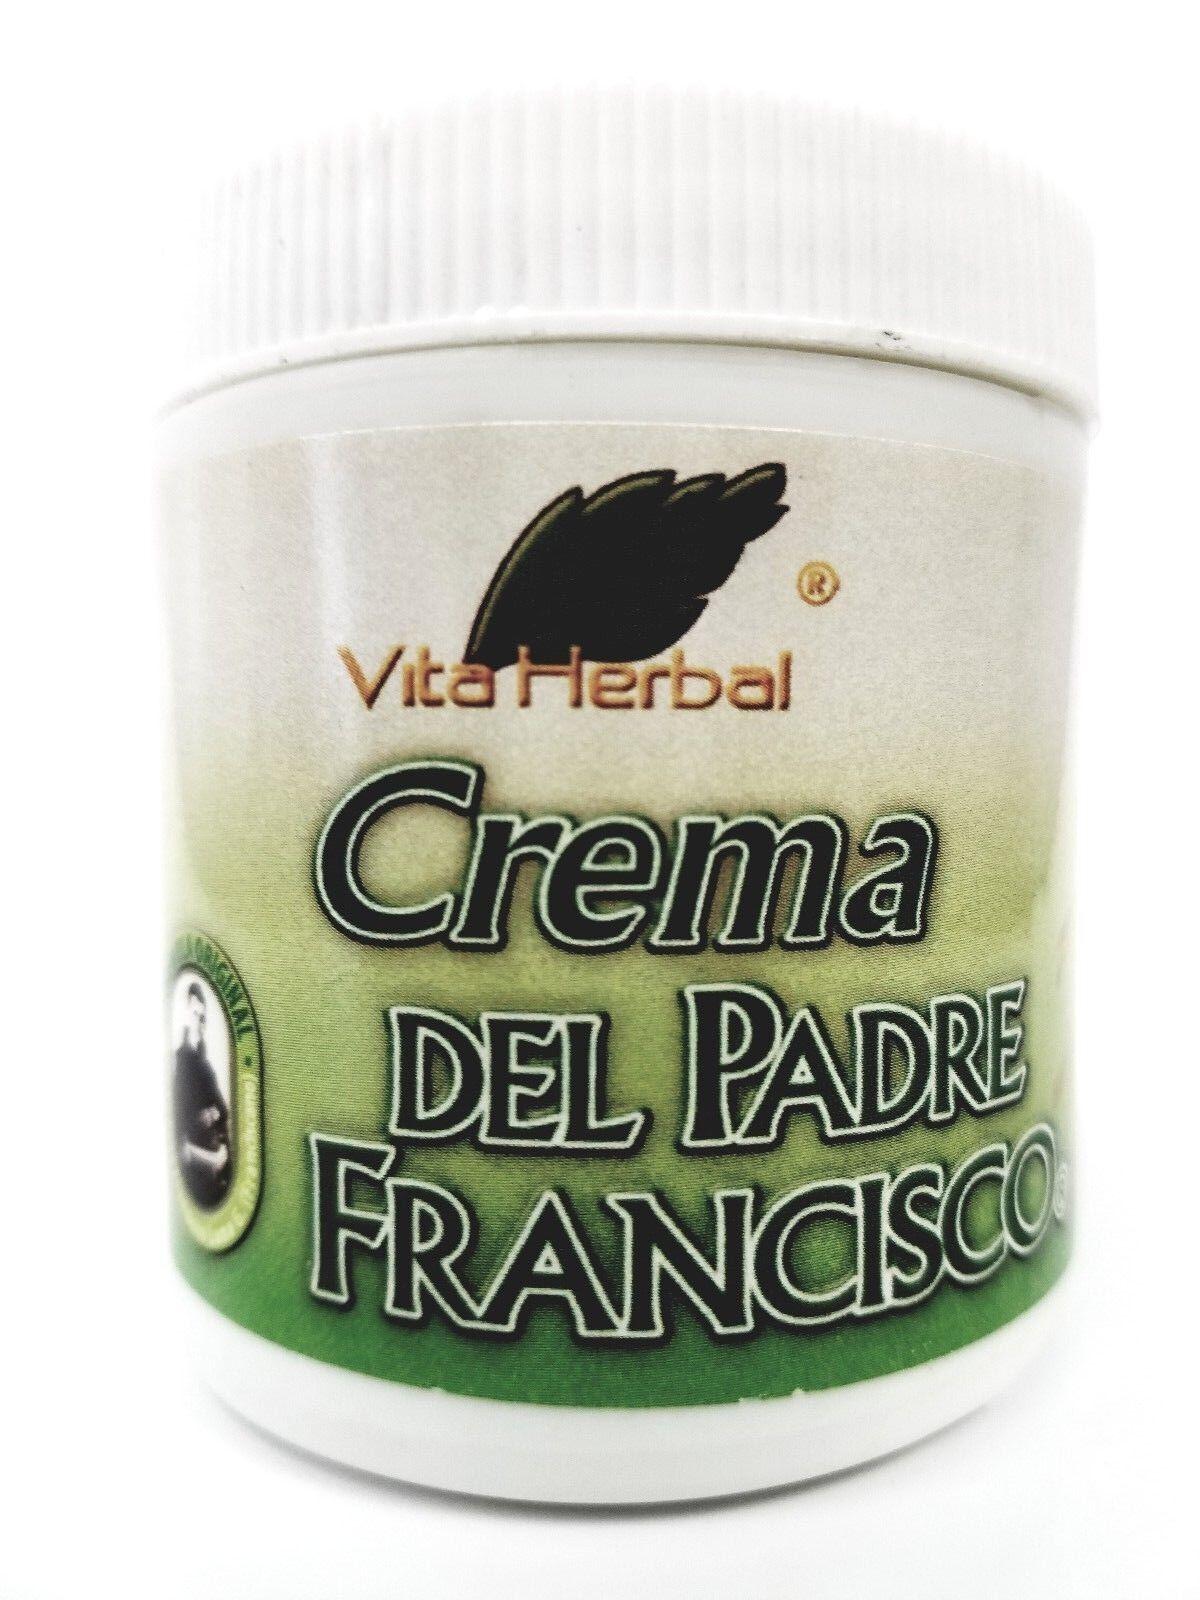 PADRE FRANCISCO CREMA MILAGROSA ARTHRITIS CREAM PAIN RELIEF ARNICA INFLAMMATION